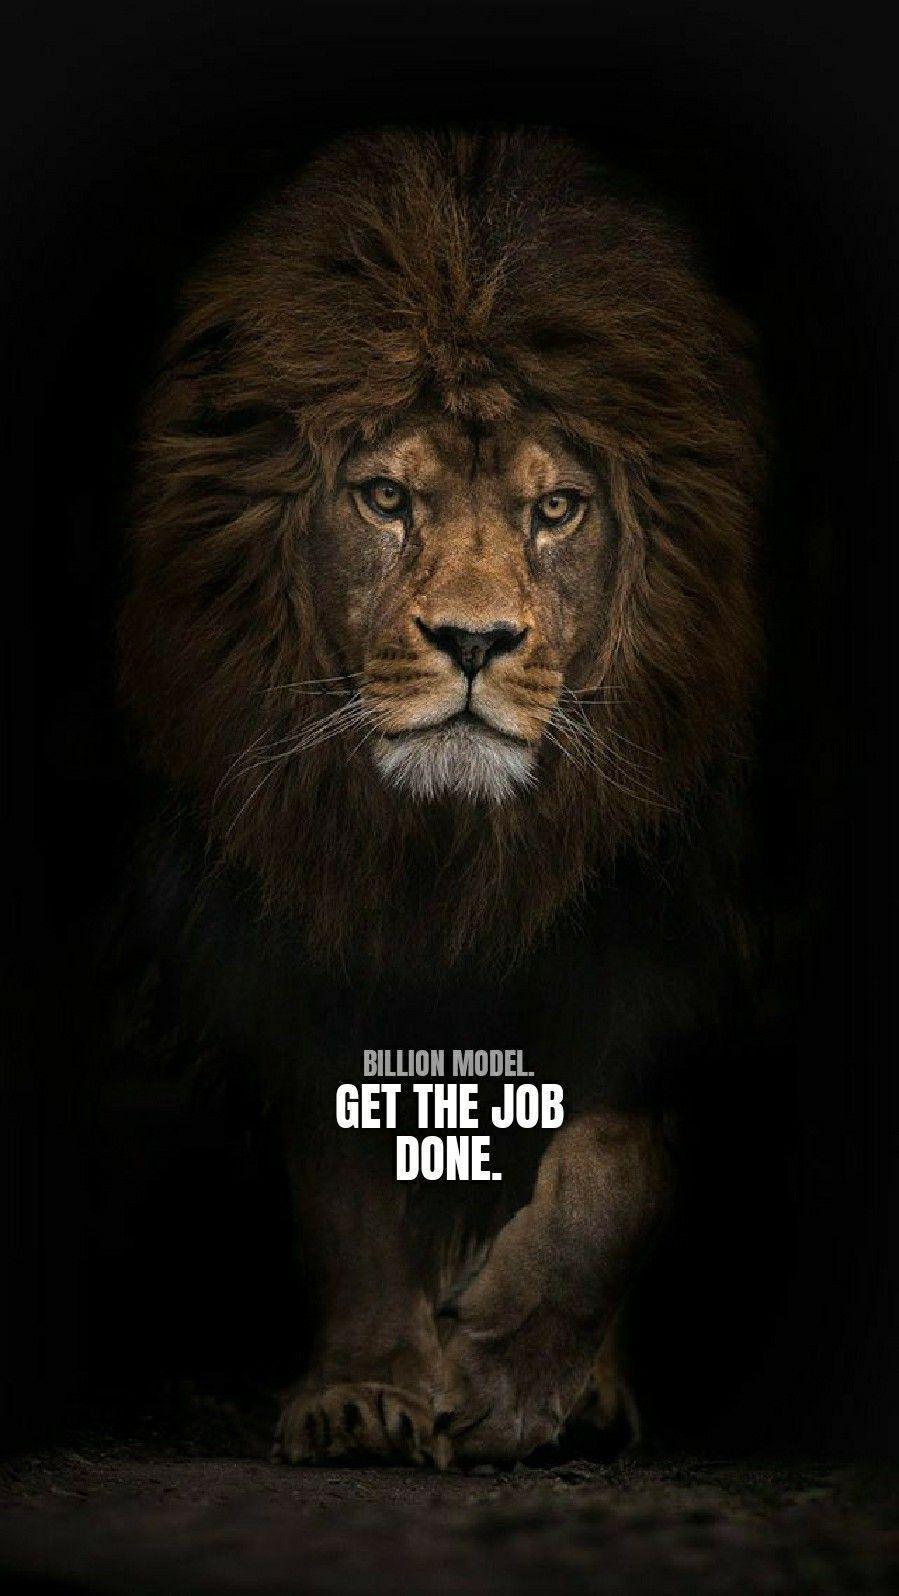 Motivational Lion Phone Wallpapers Top Free Motivational